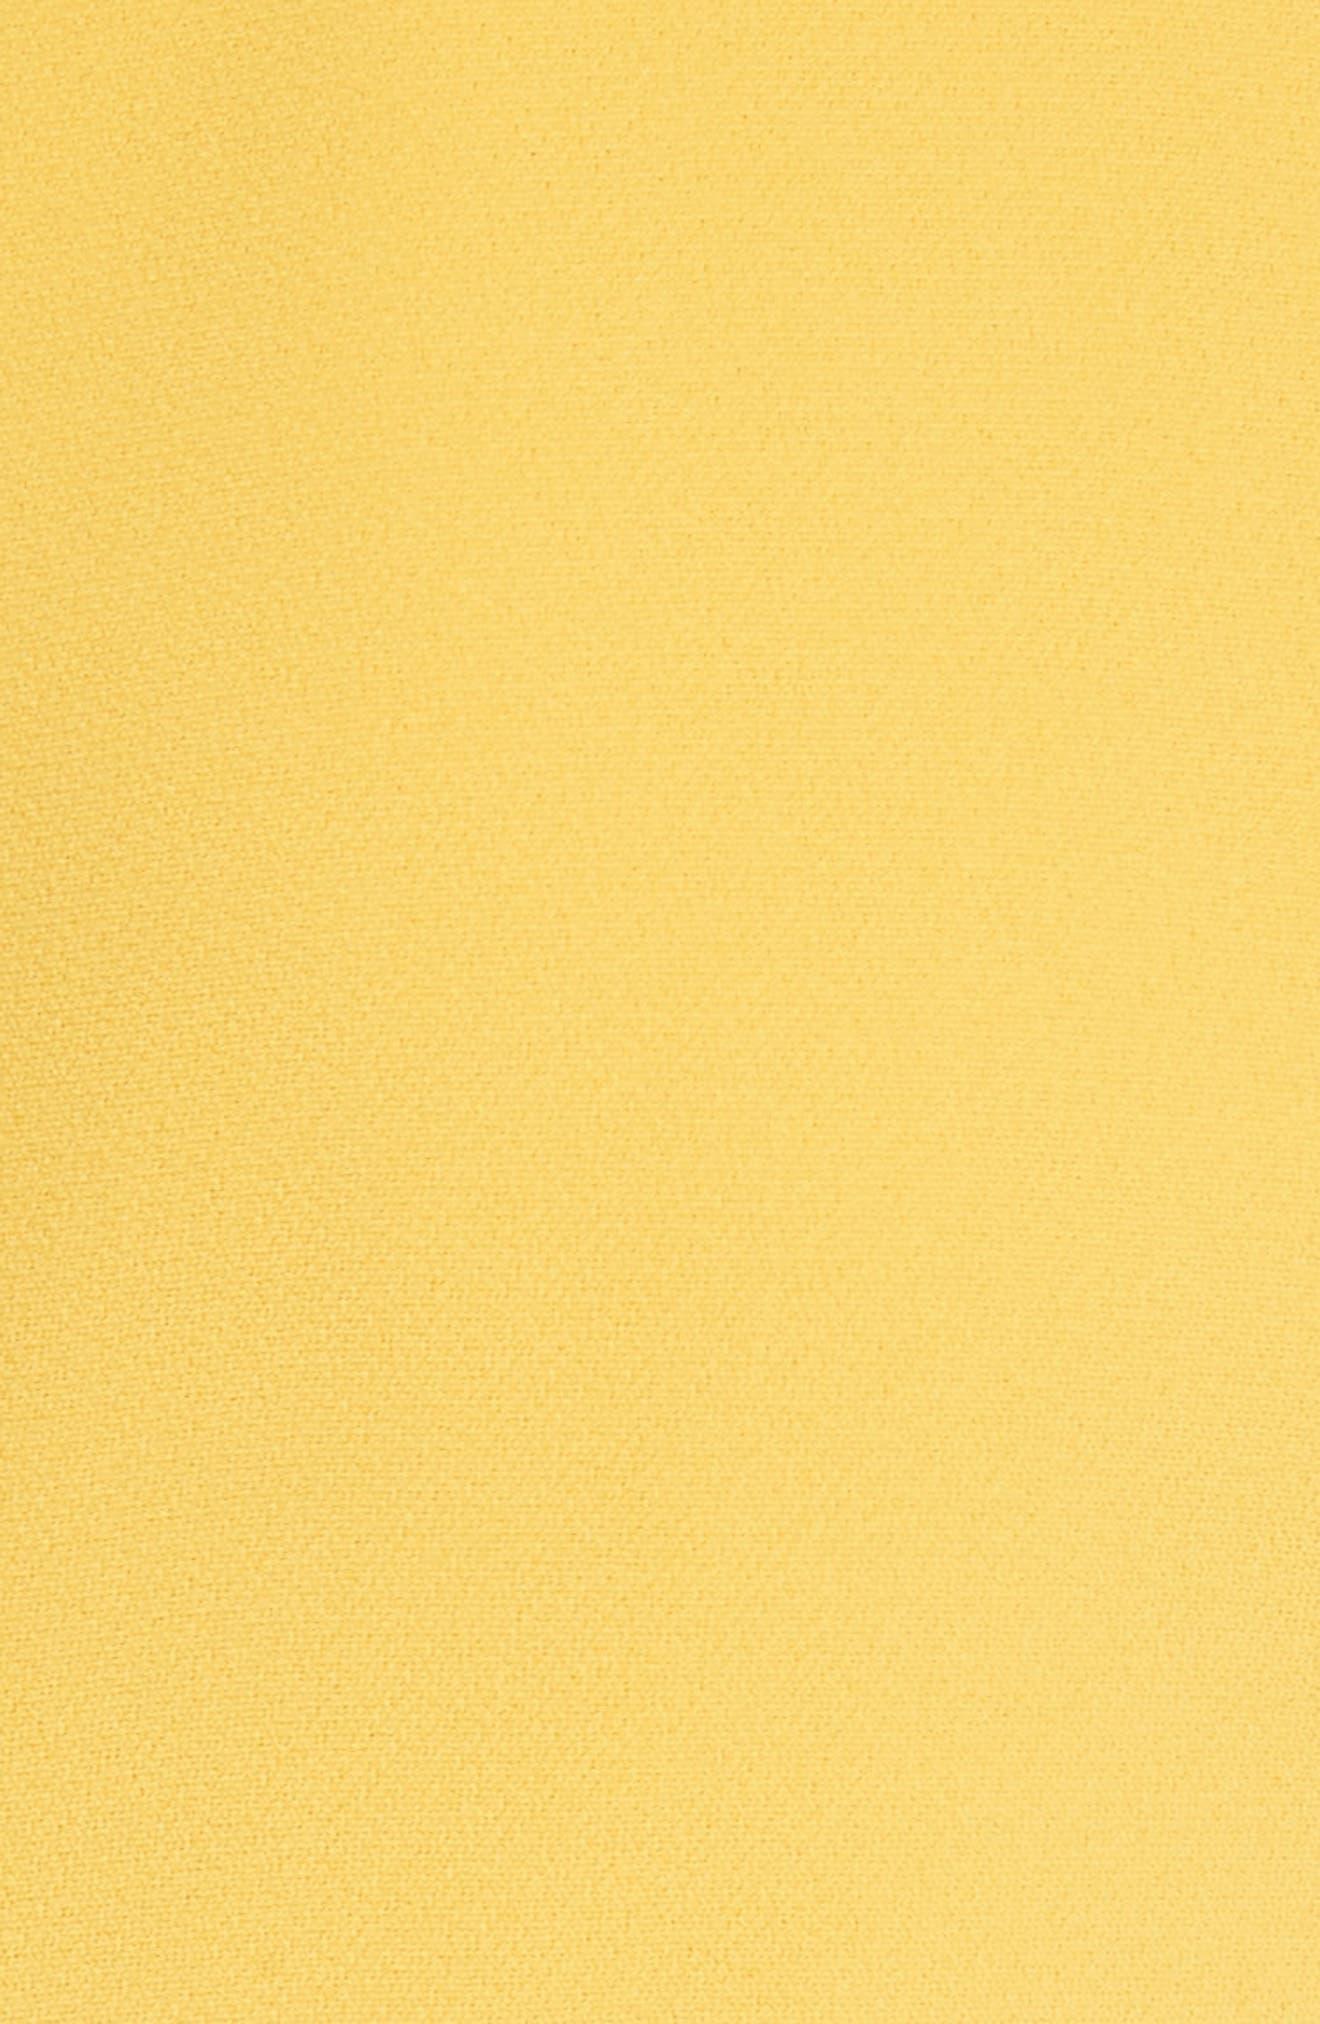 Sheath Midi Dress,                             Alternate thumbnail 6, color,                             Yellow